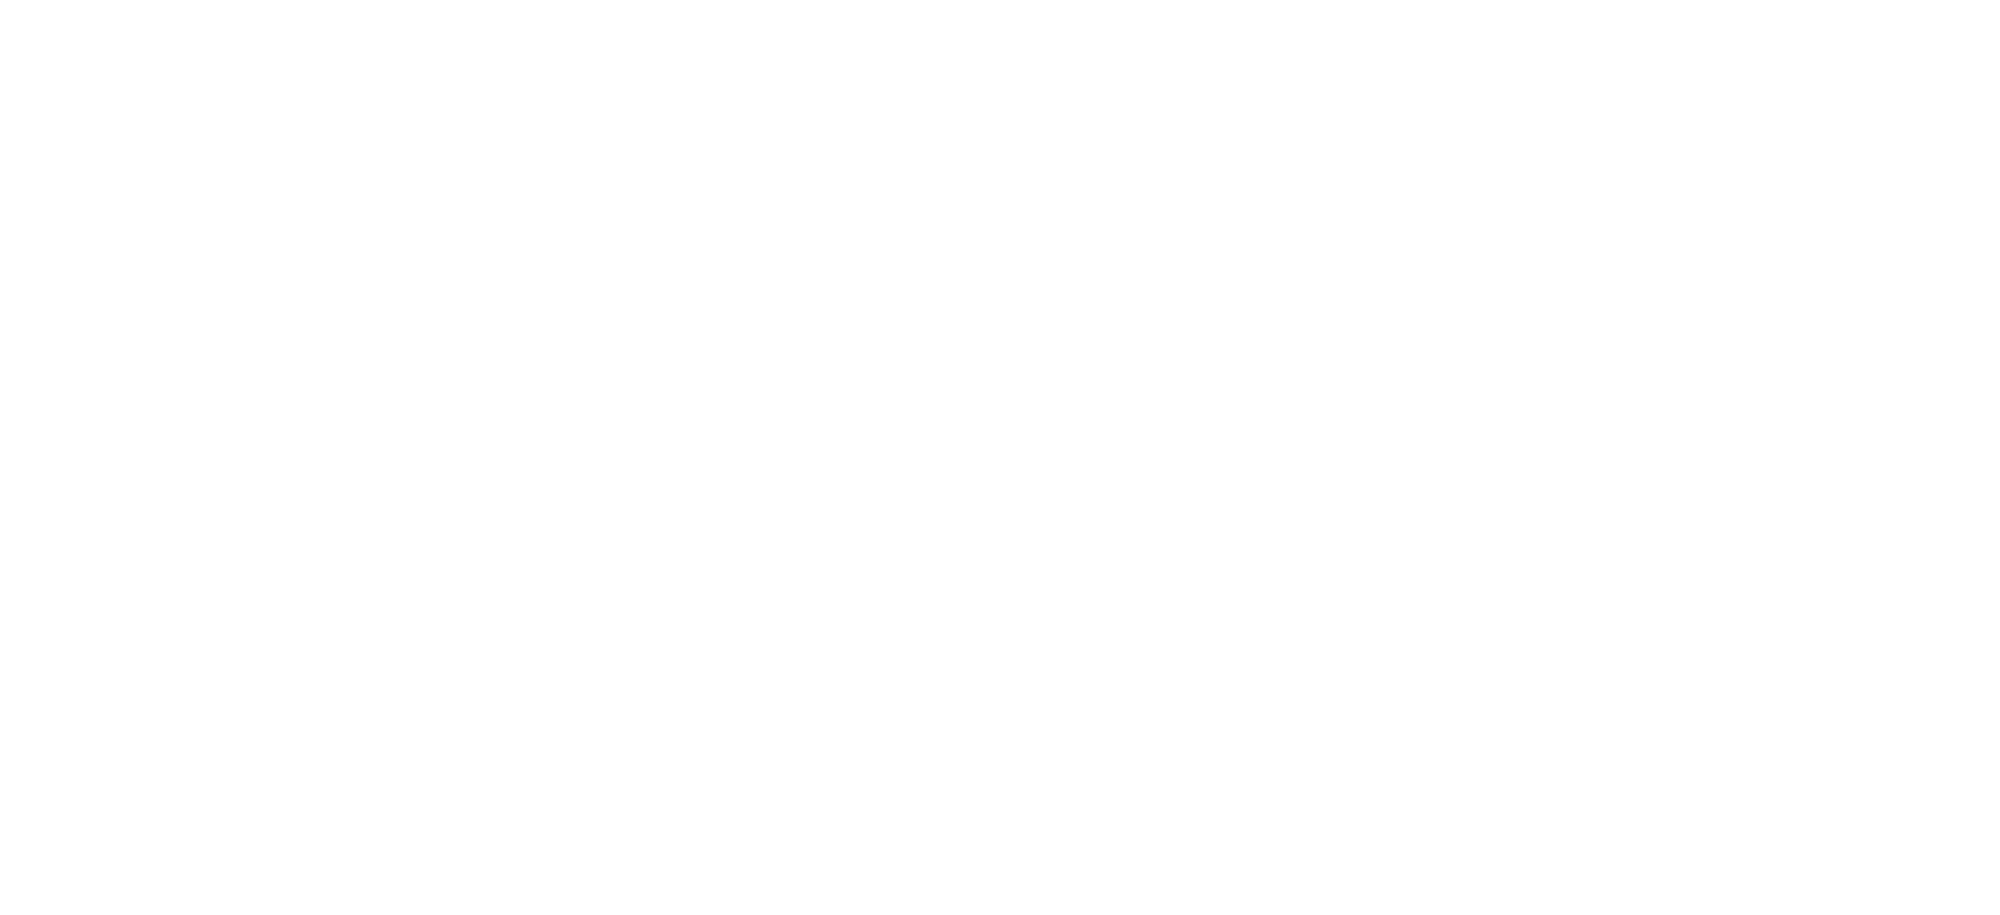 Revising Rubies